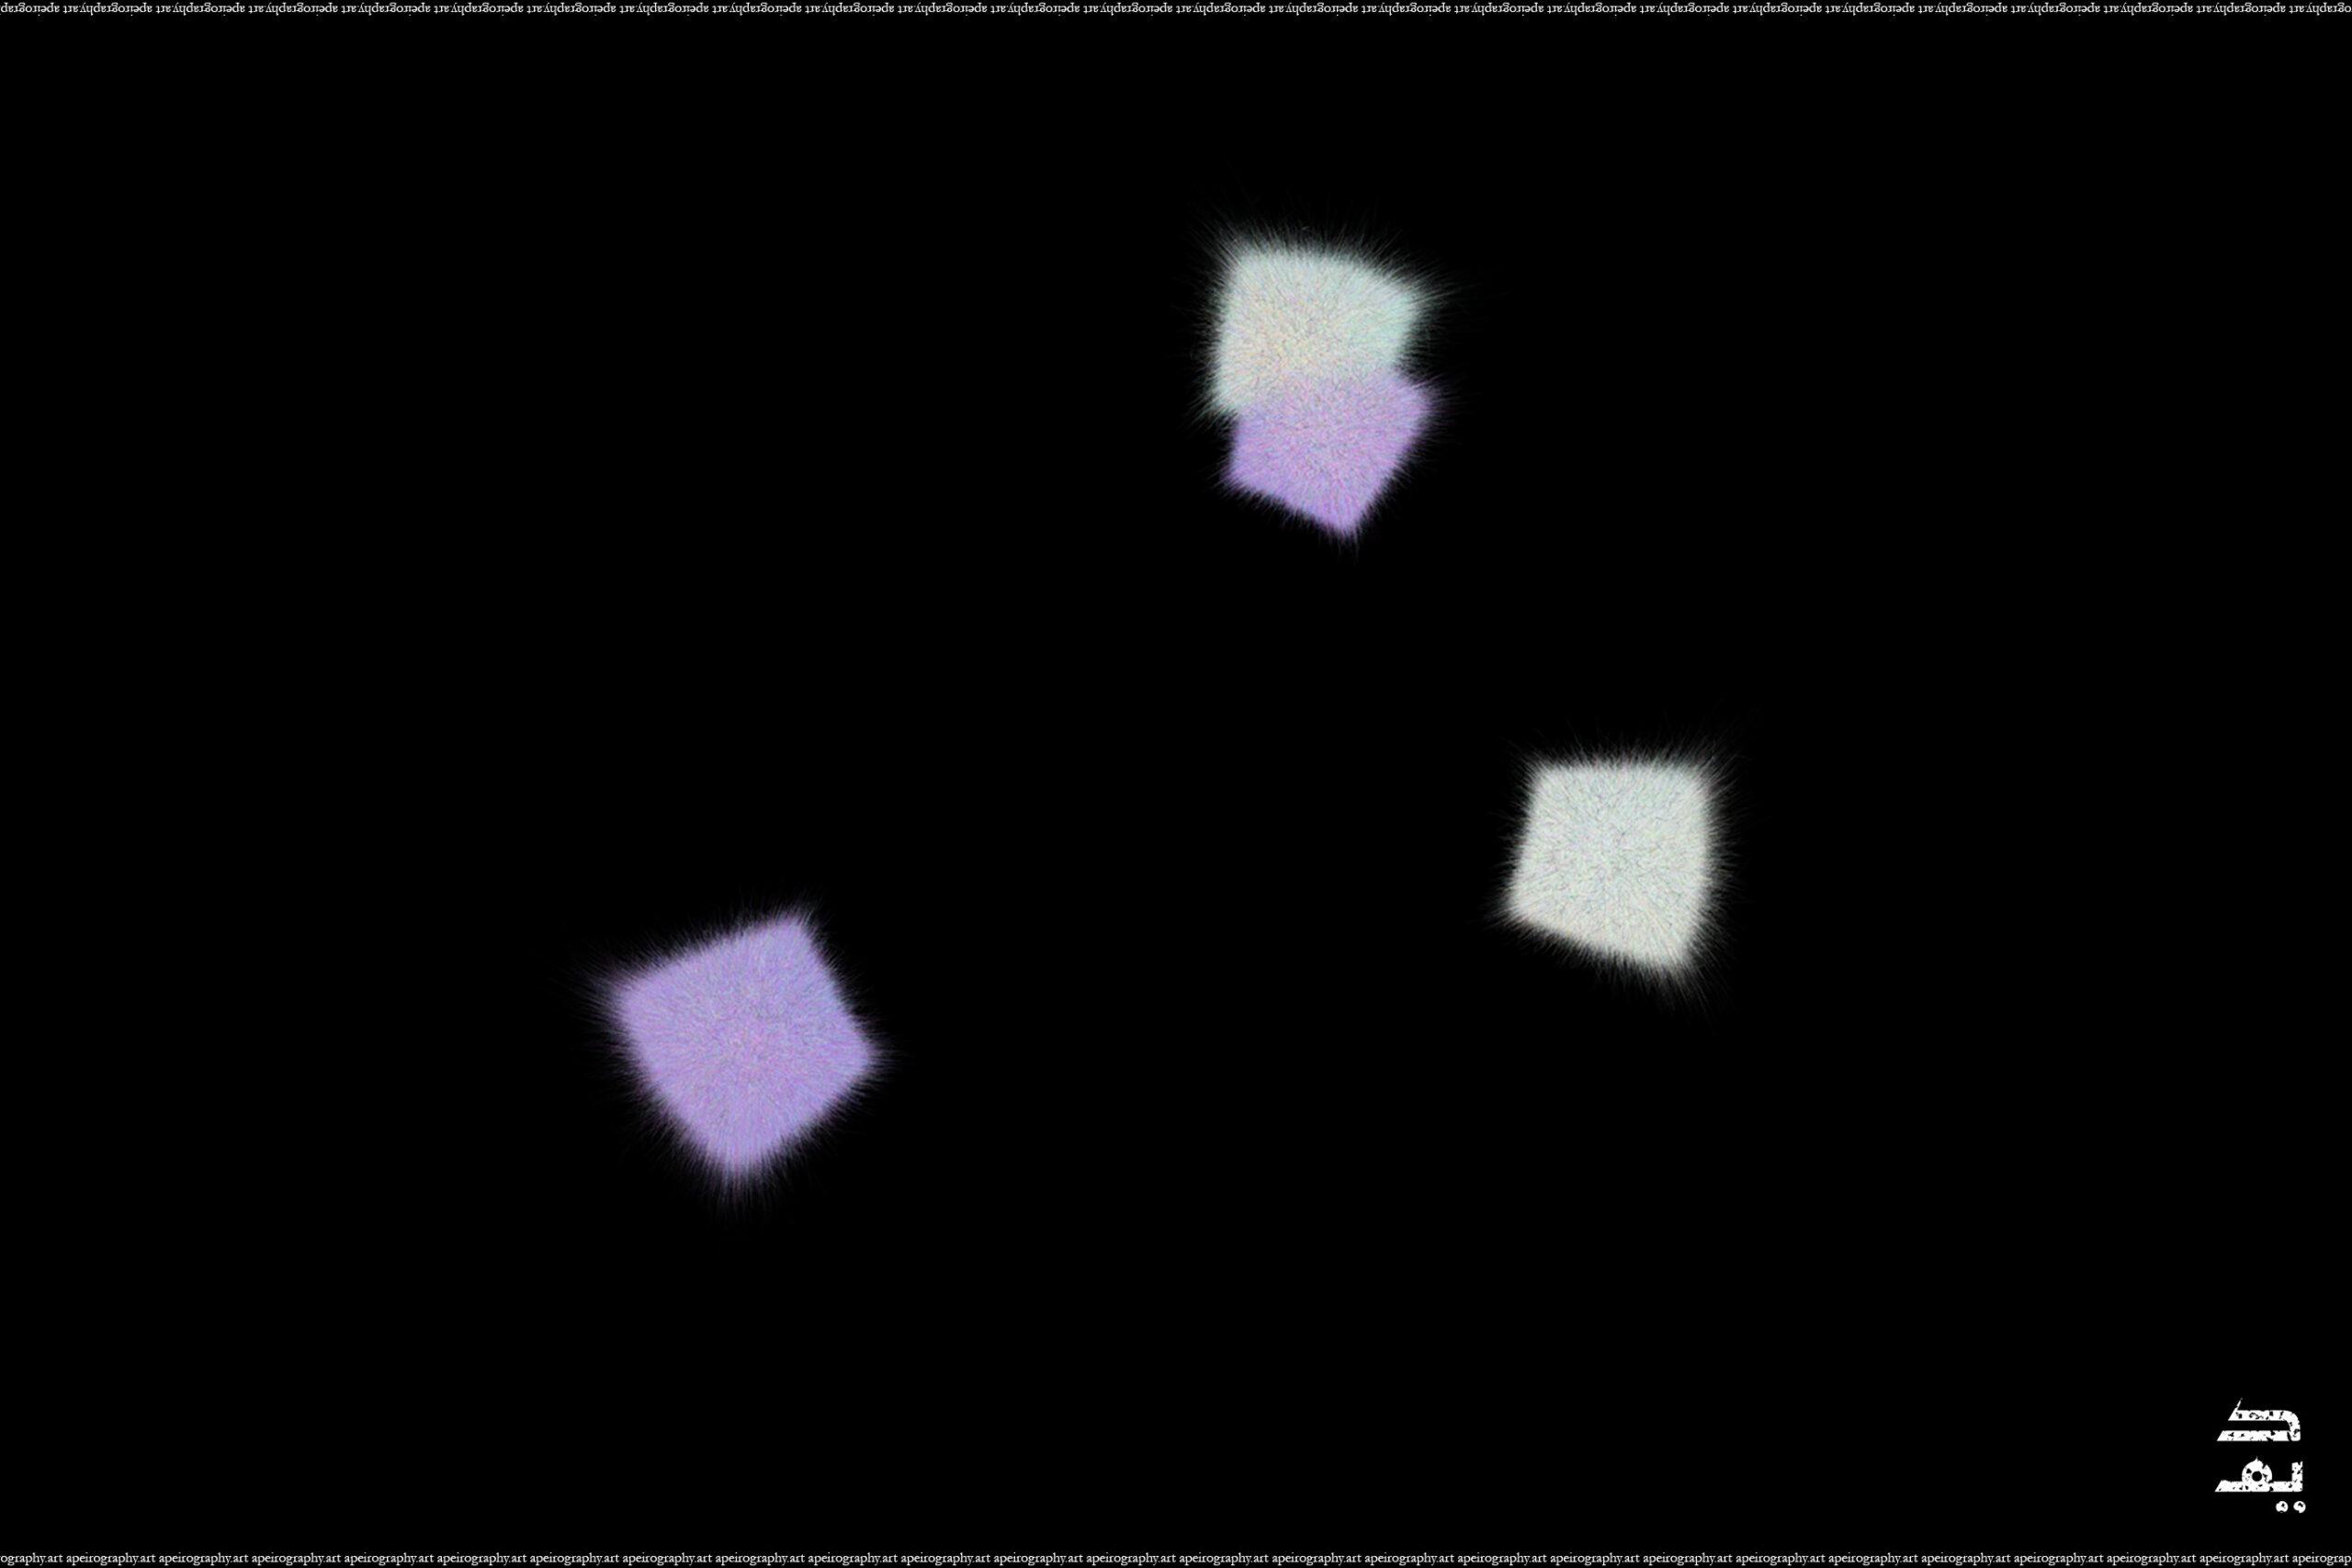 tribbles_08_Final_Frame